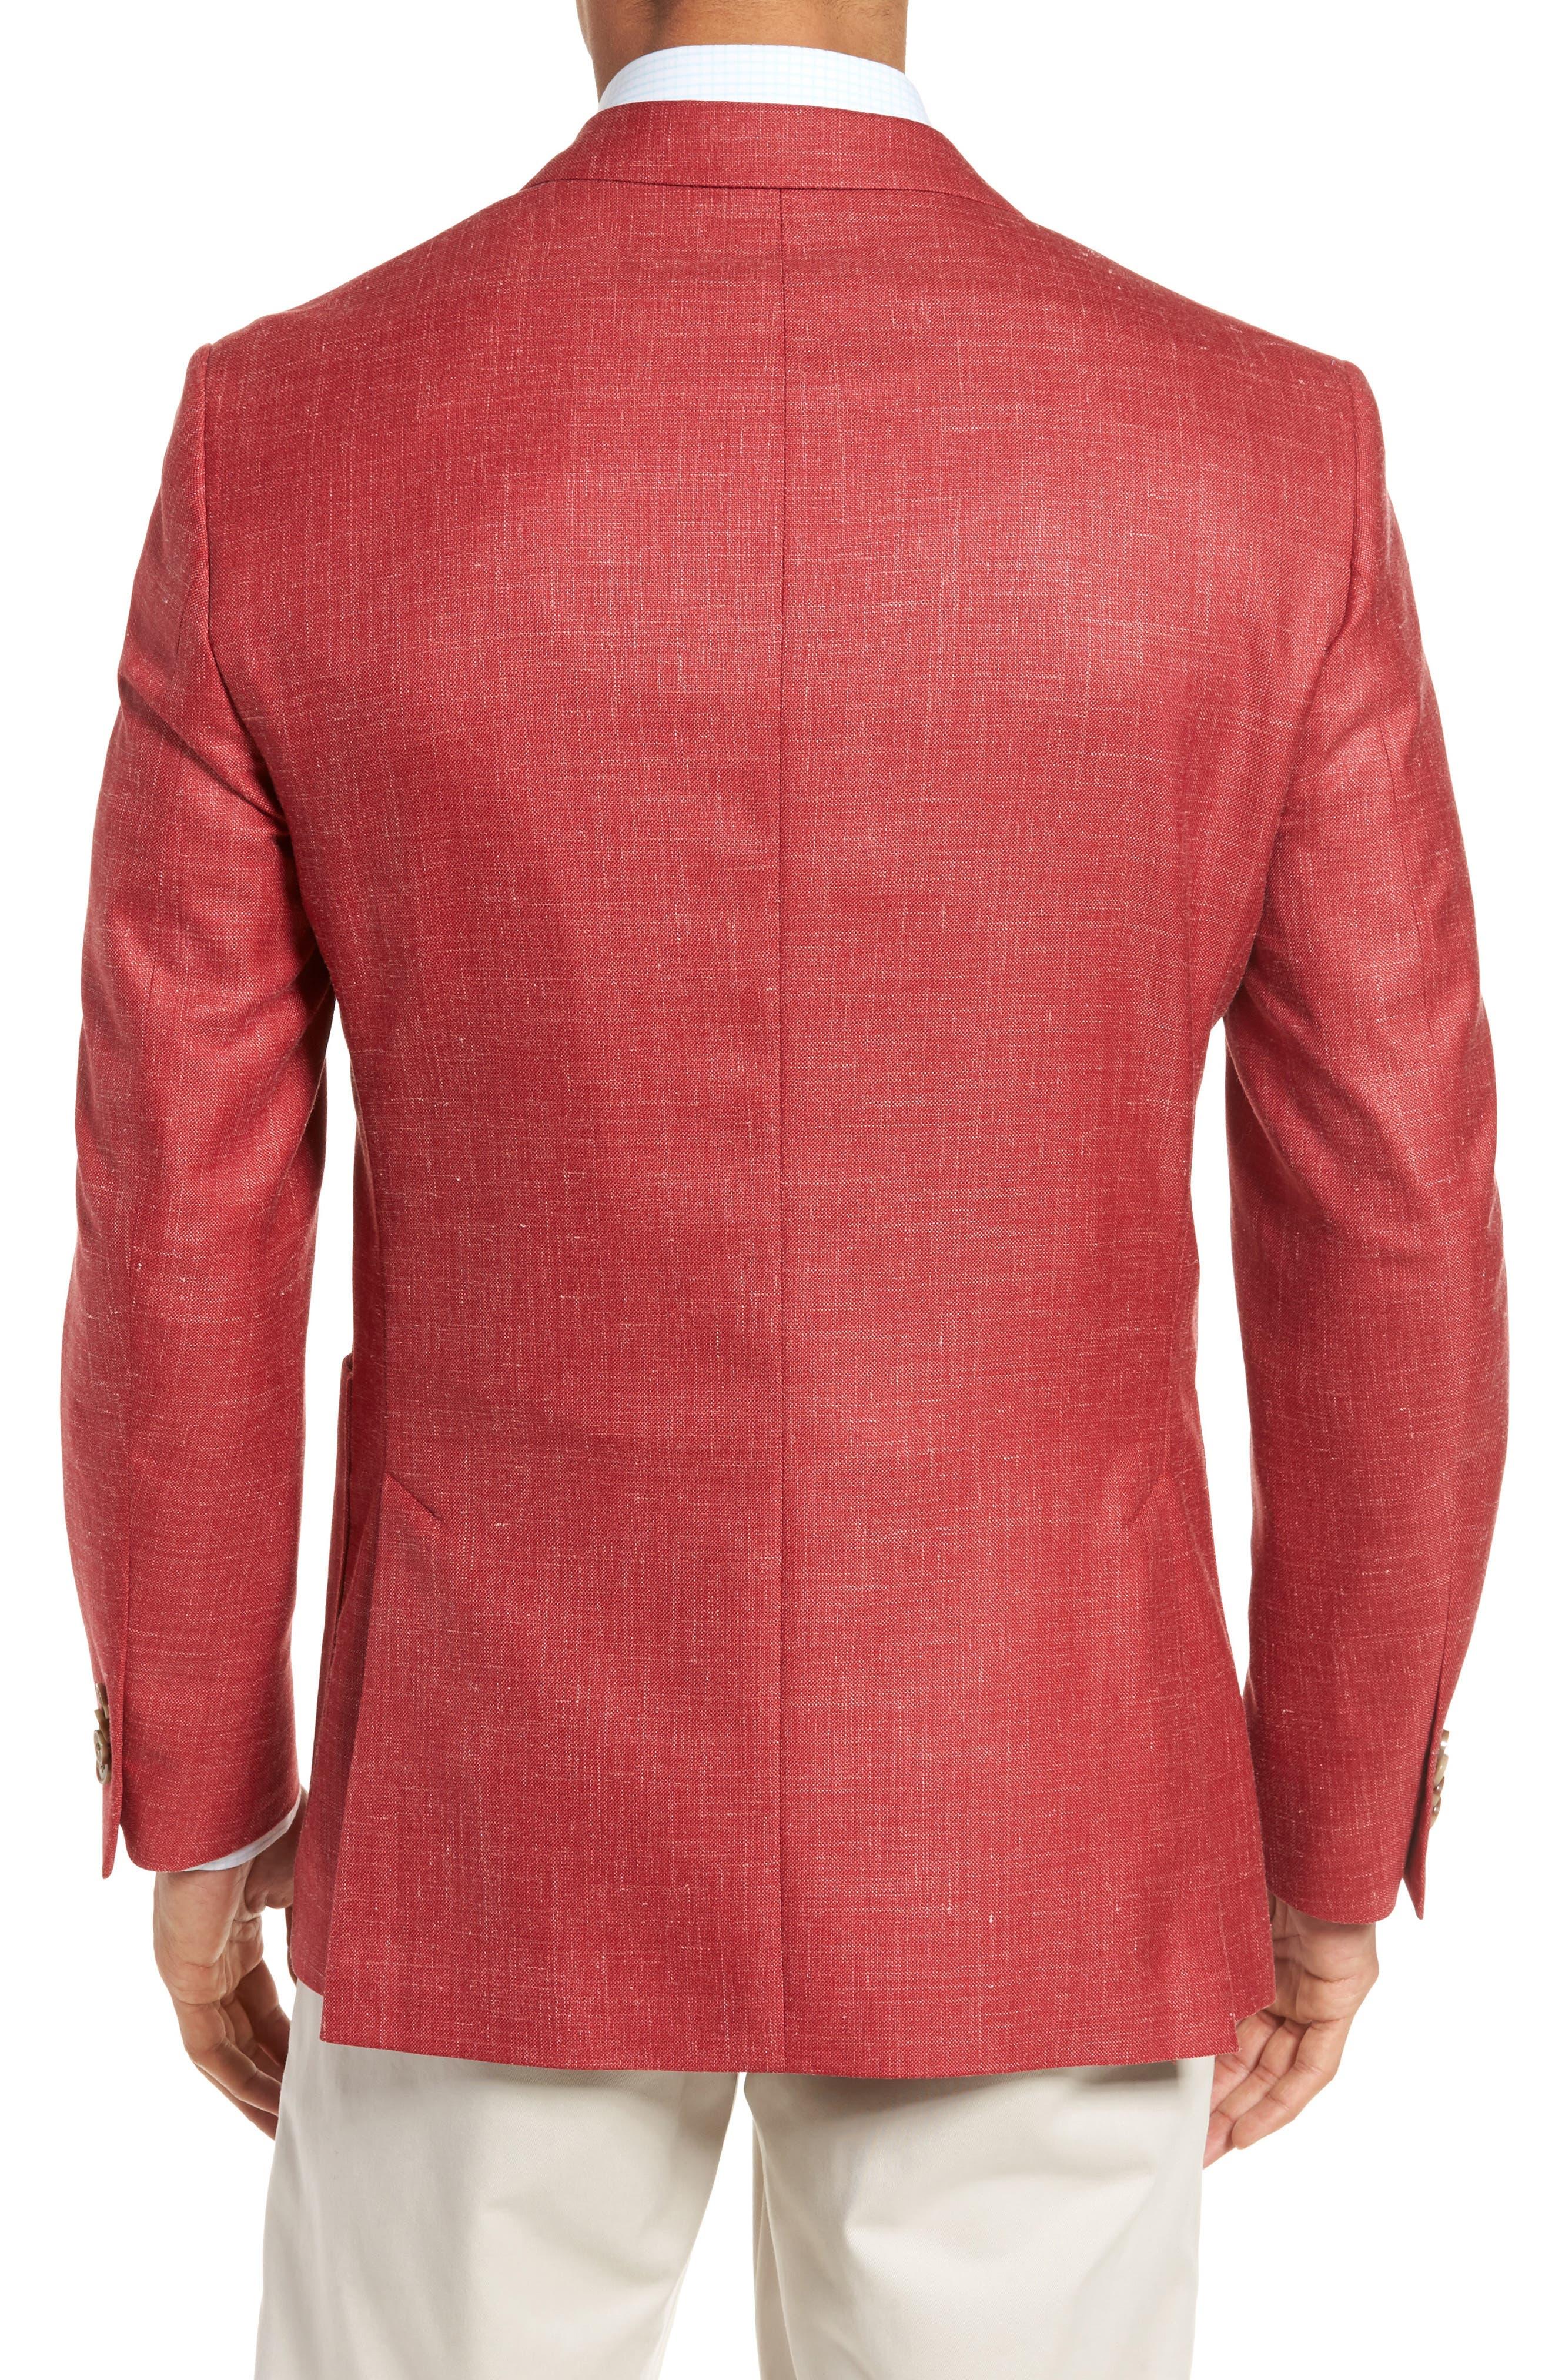 Alternate Image 2  - Peter Millar Classic Fit Wool Blend Blazer